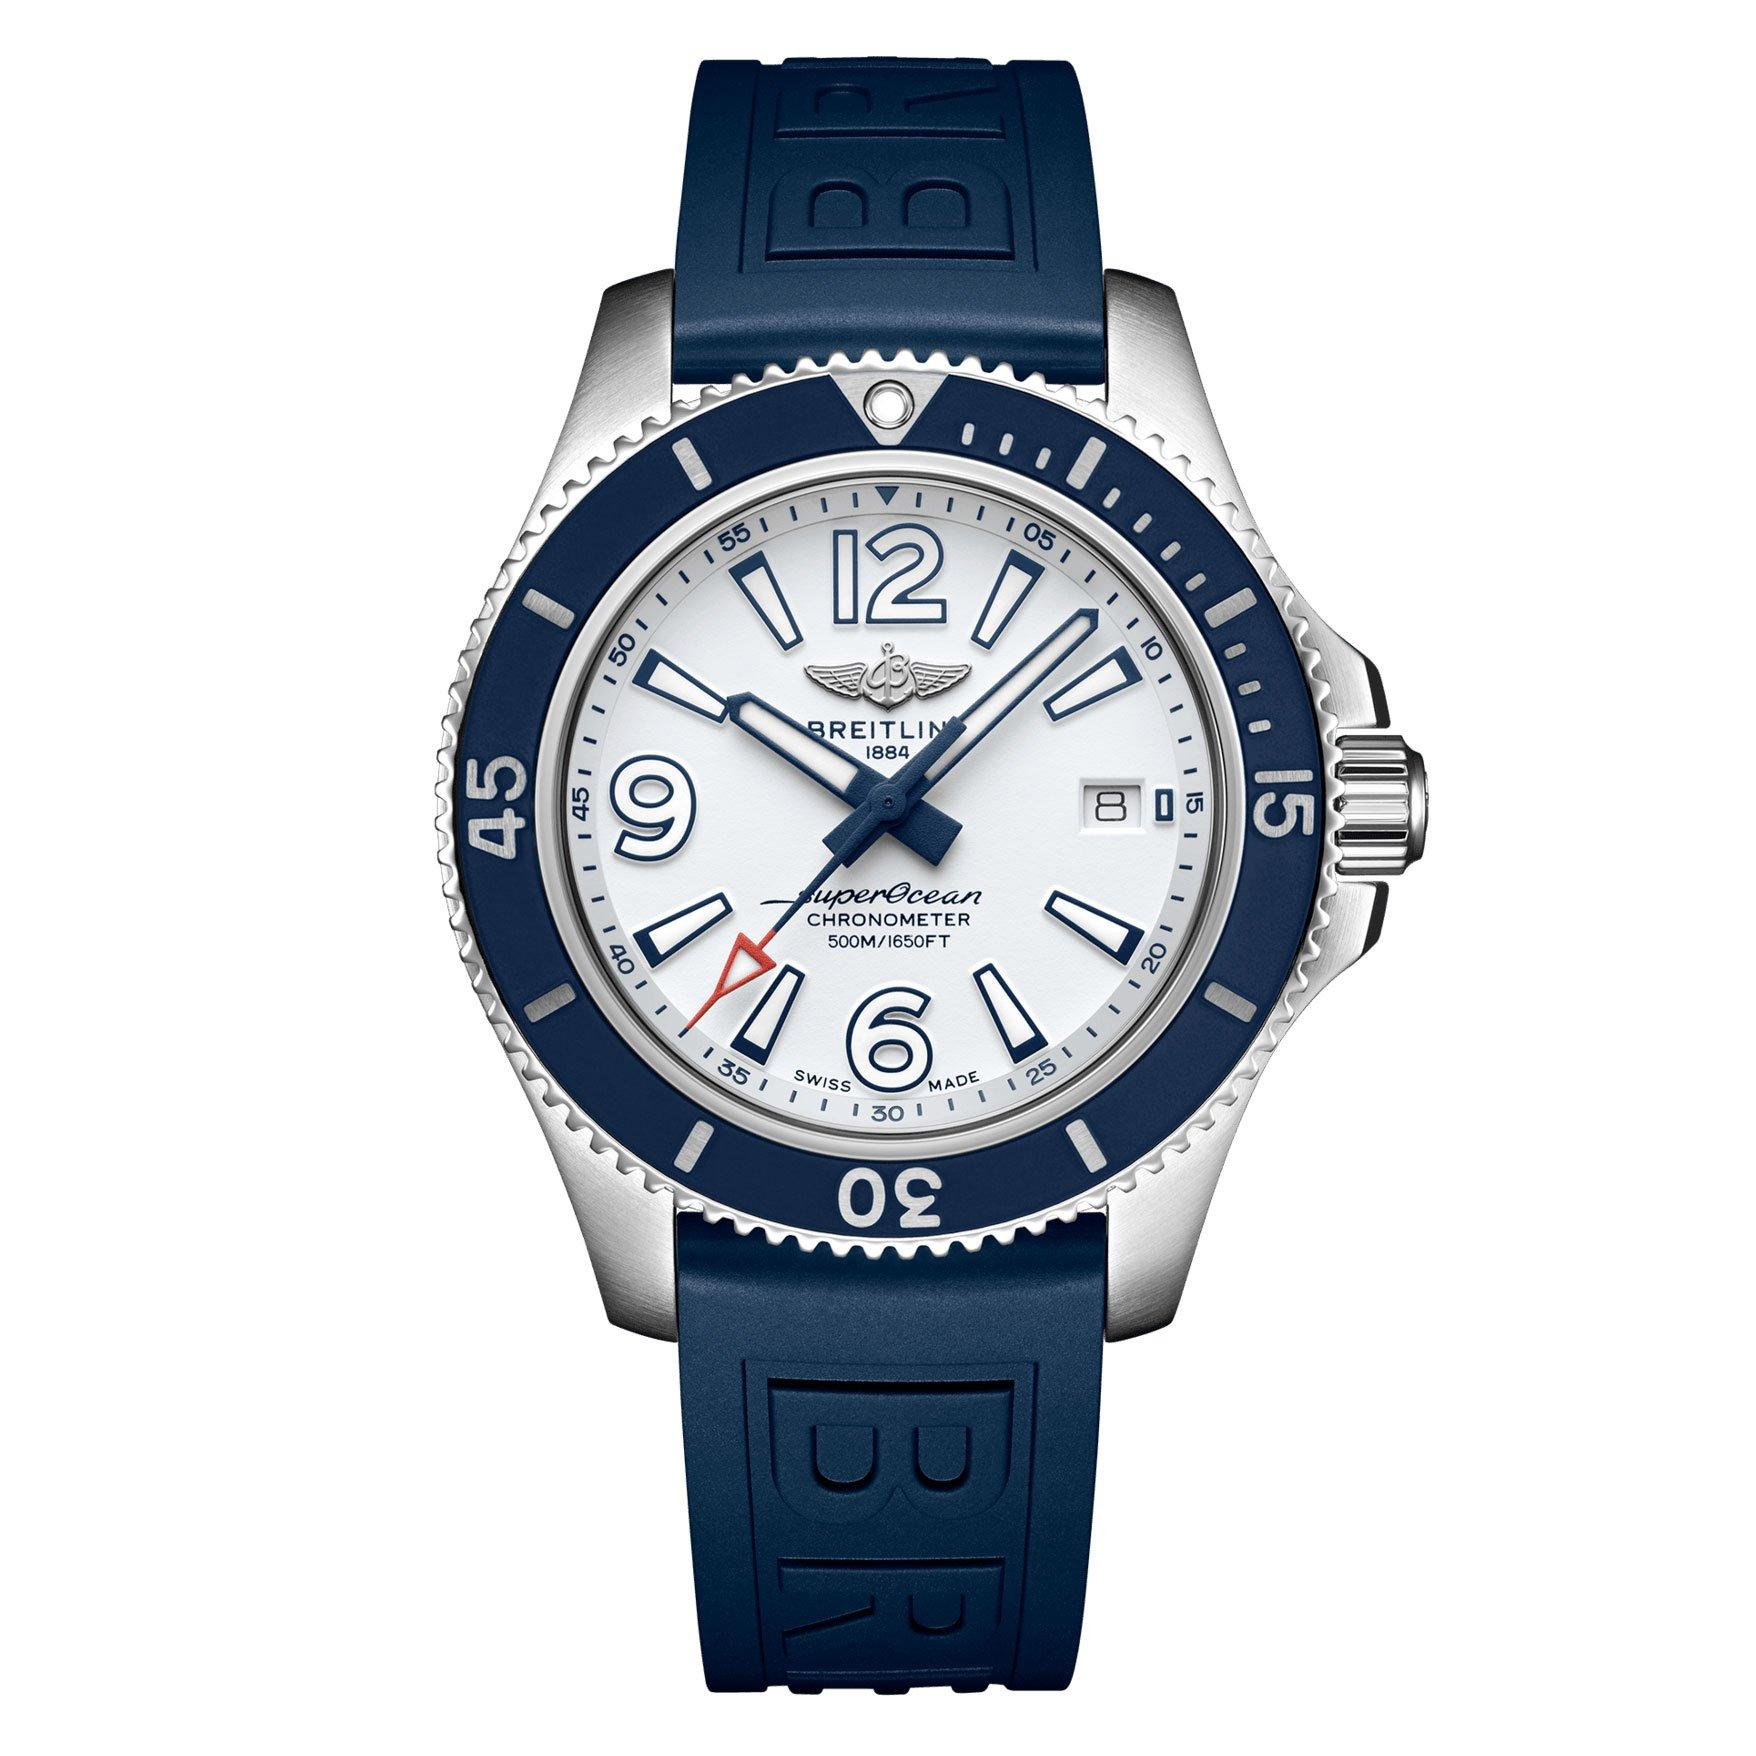 Breitling Superocean 42 Automatic Men's Watch